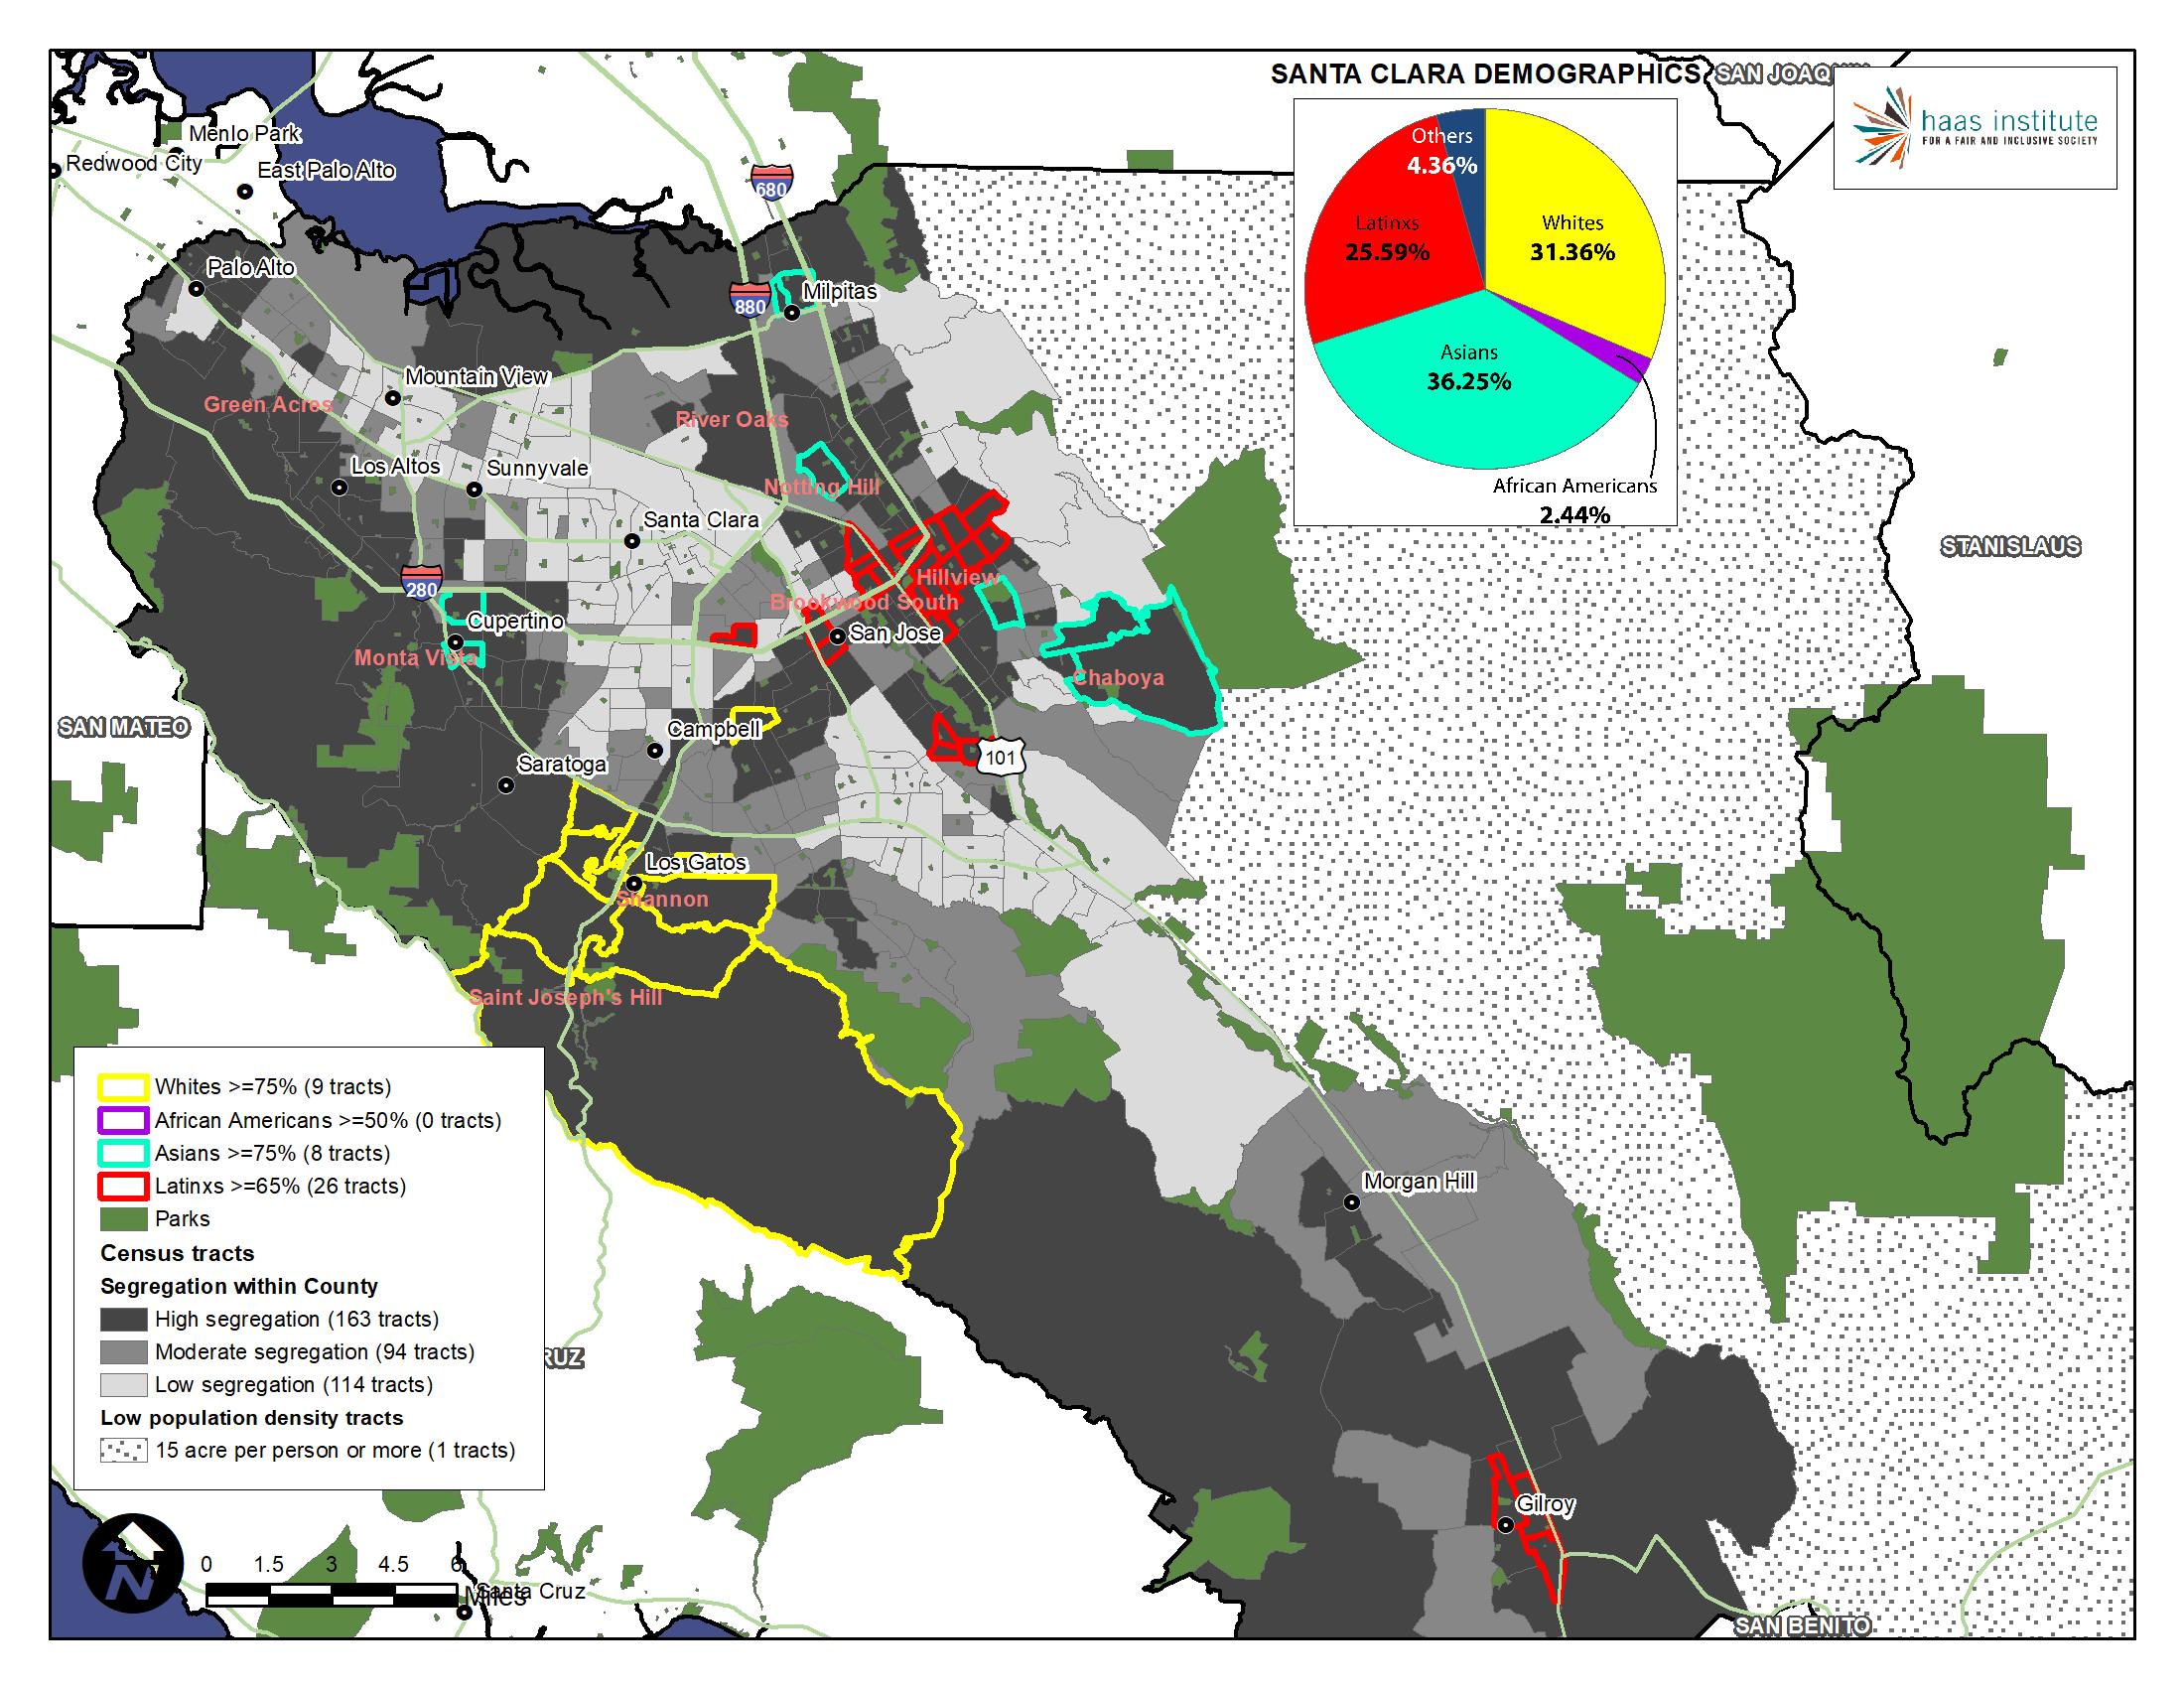 Map shows demographics of Santa Clara County